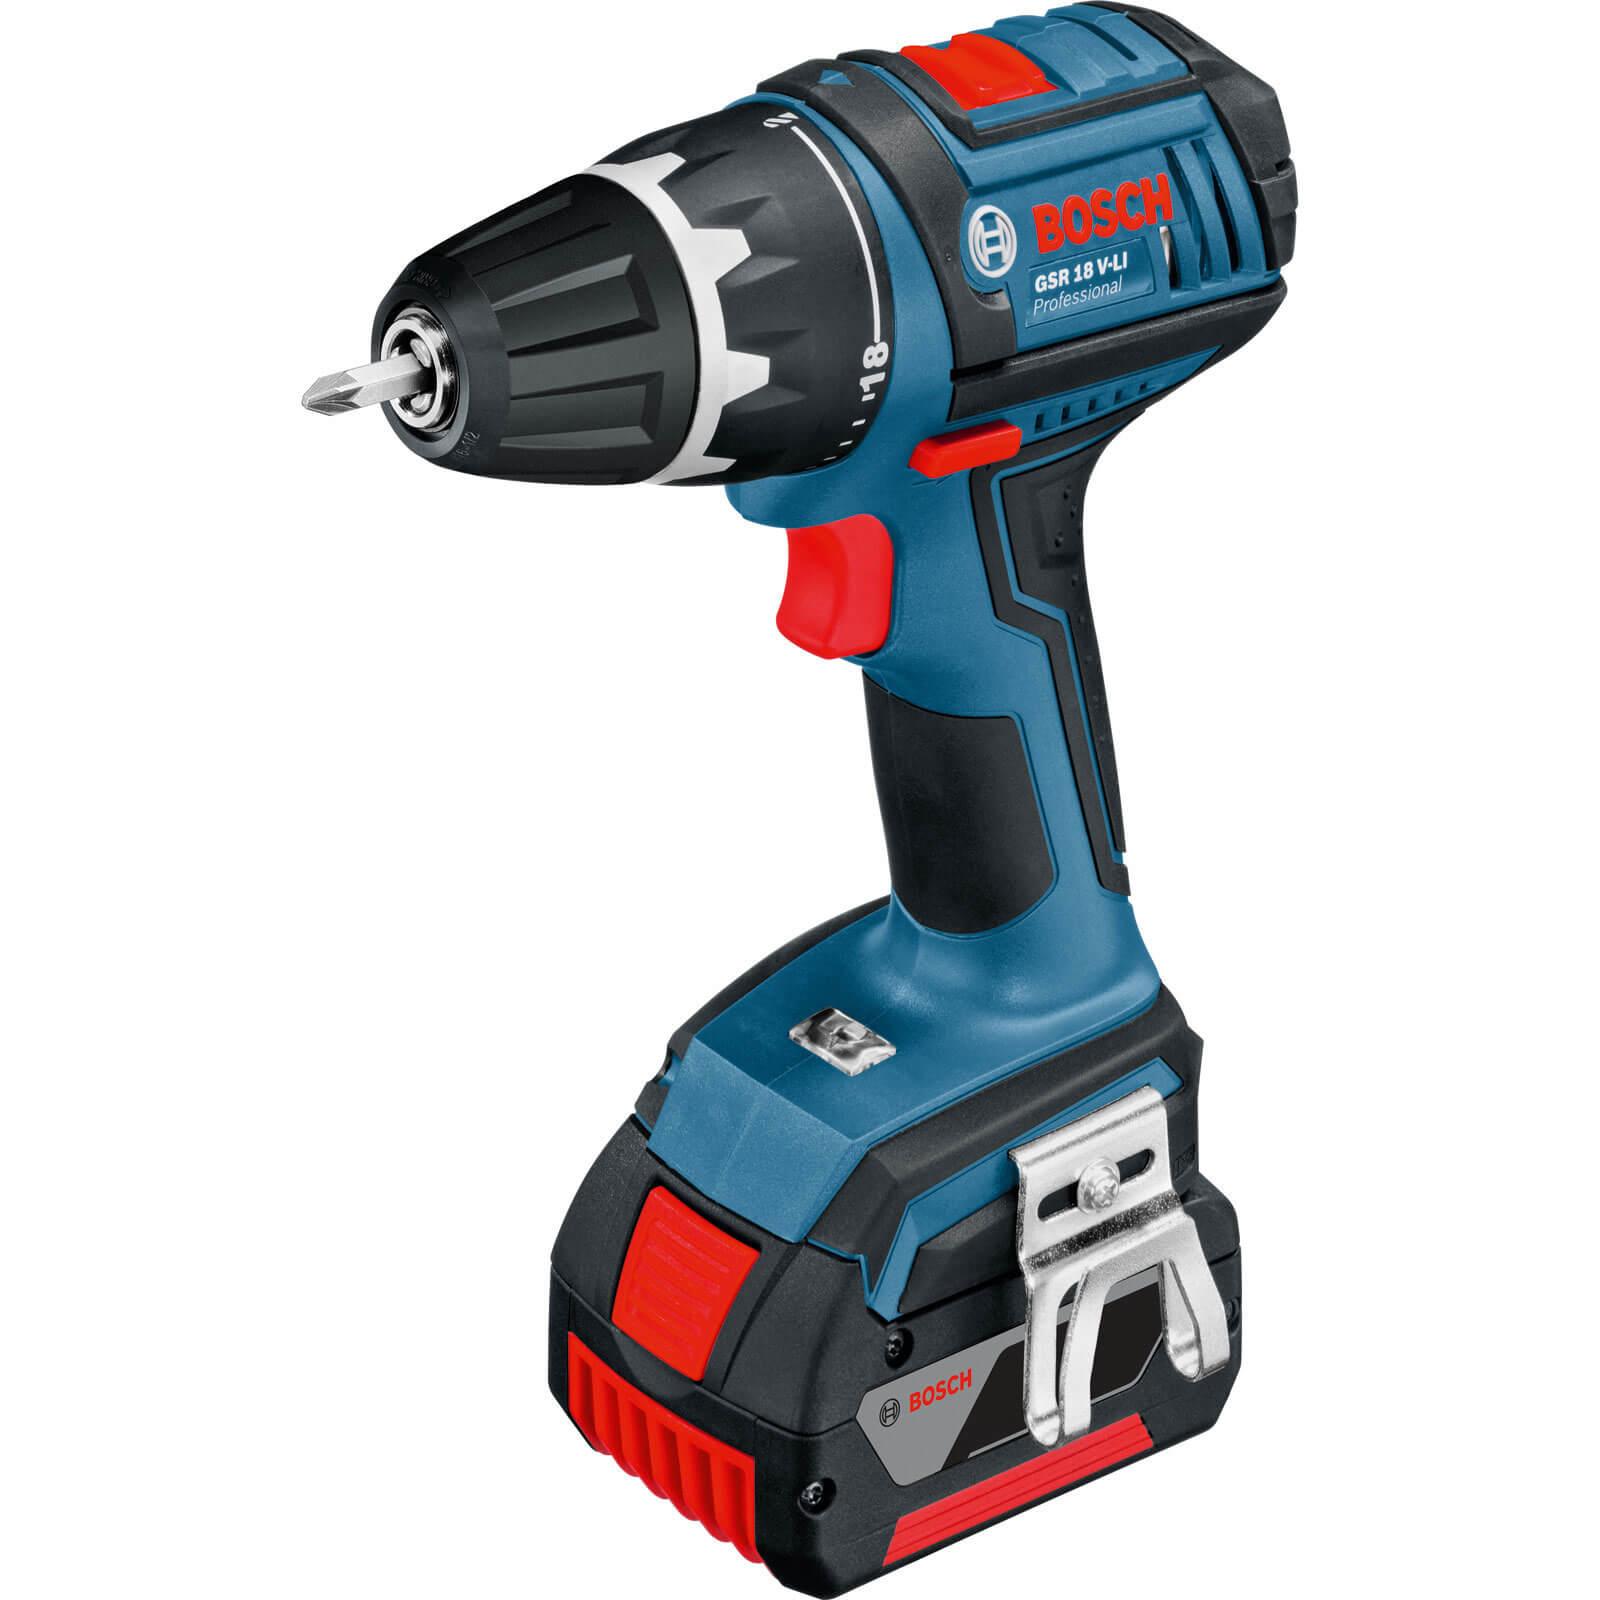 Bosch GSR 18 VLI 18v Cordless Drill Driver 2 x 1.3ah Liion Charger Case